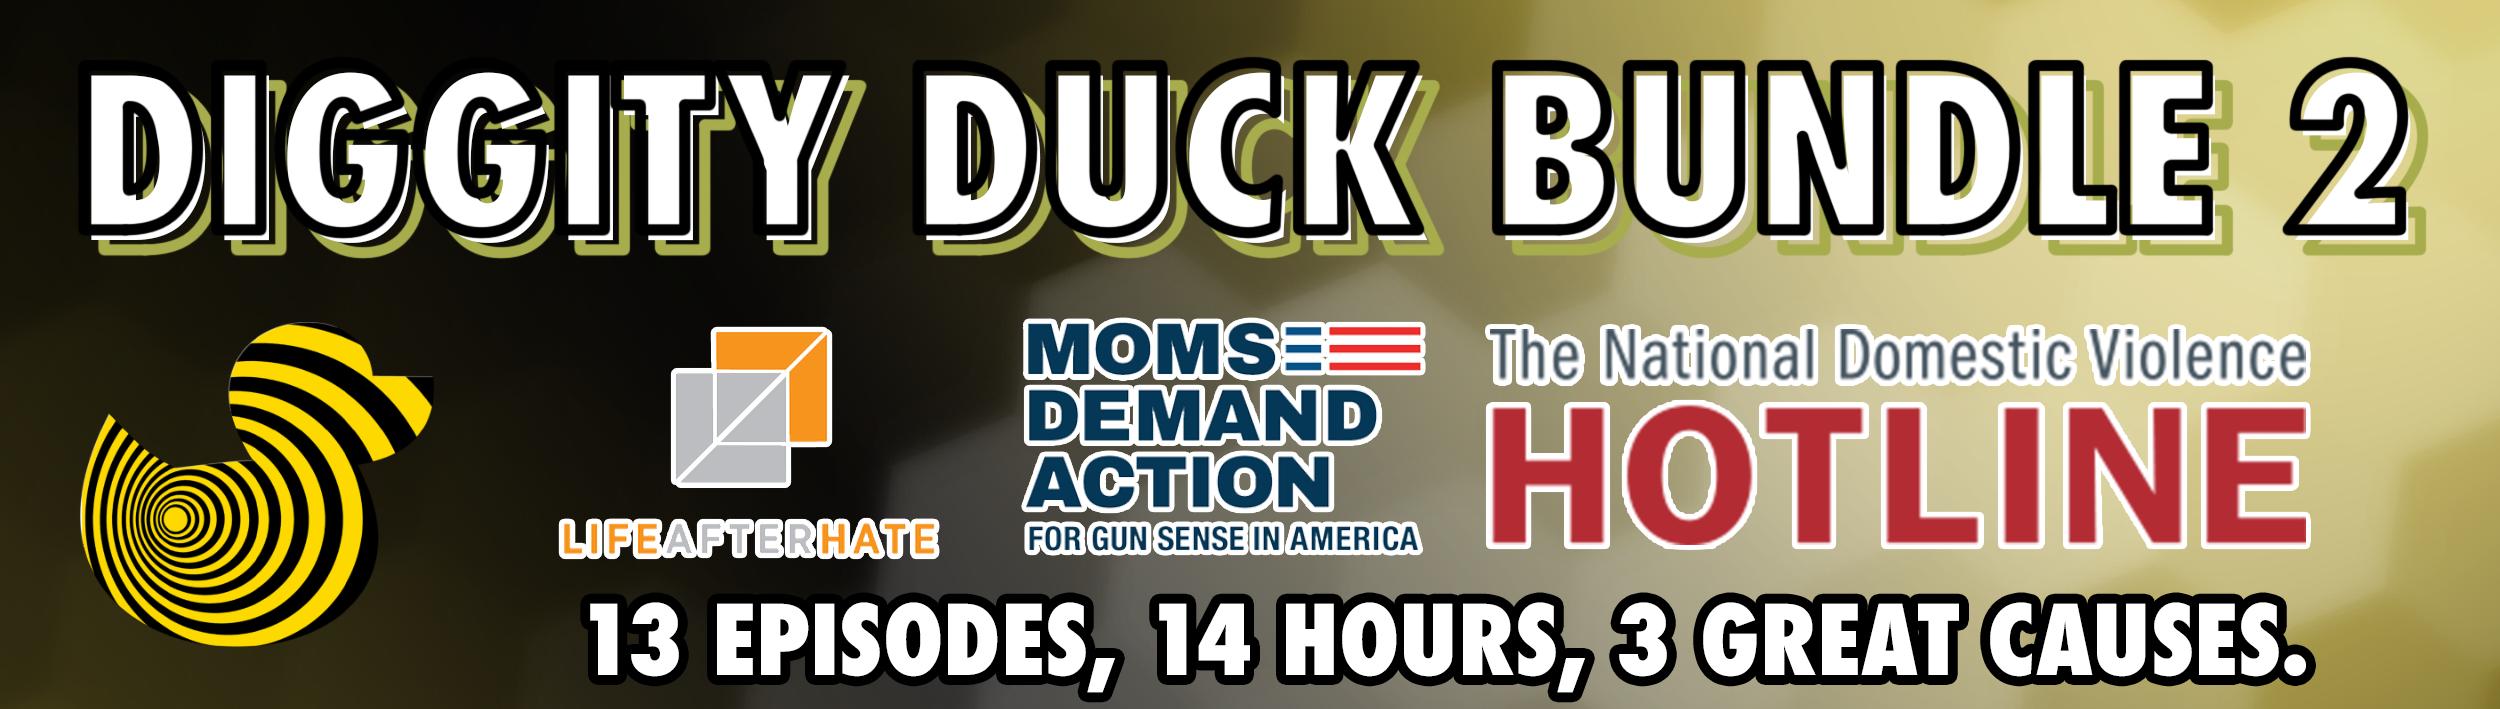 Duck Bundle 2 Banner.png